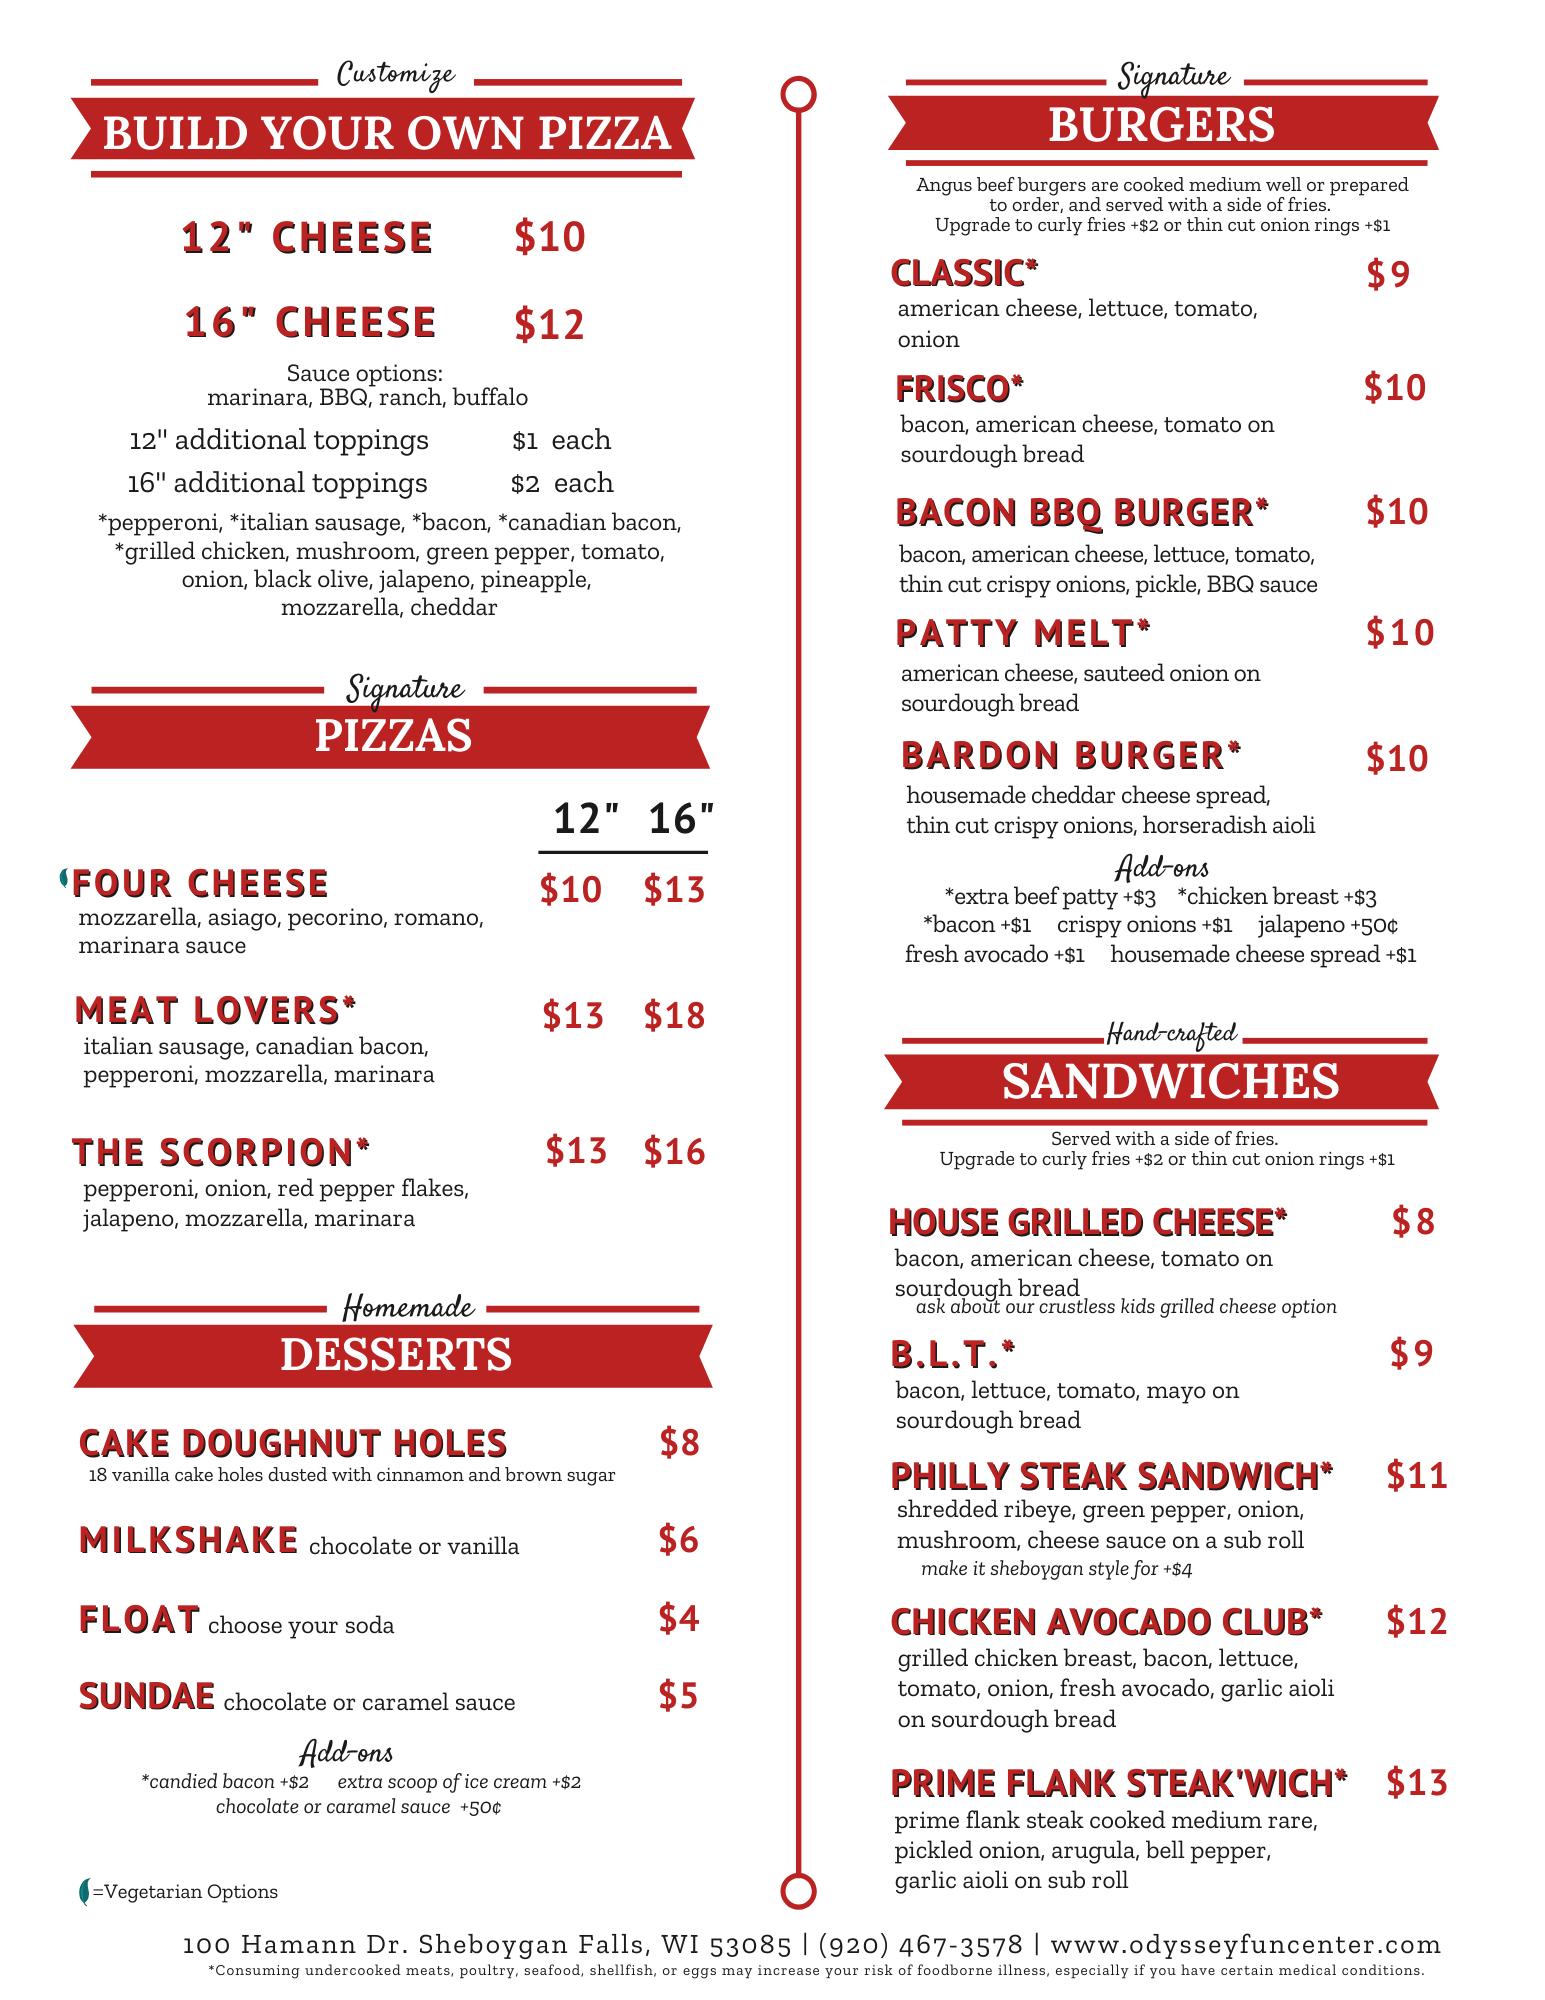 Odyssey Bar and Grill | Pizzas | Sandwiches | Desserts | Sheboygan WI